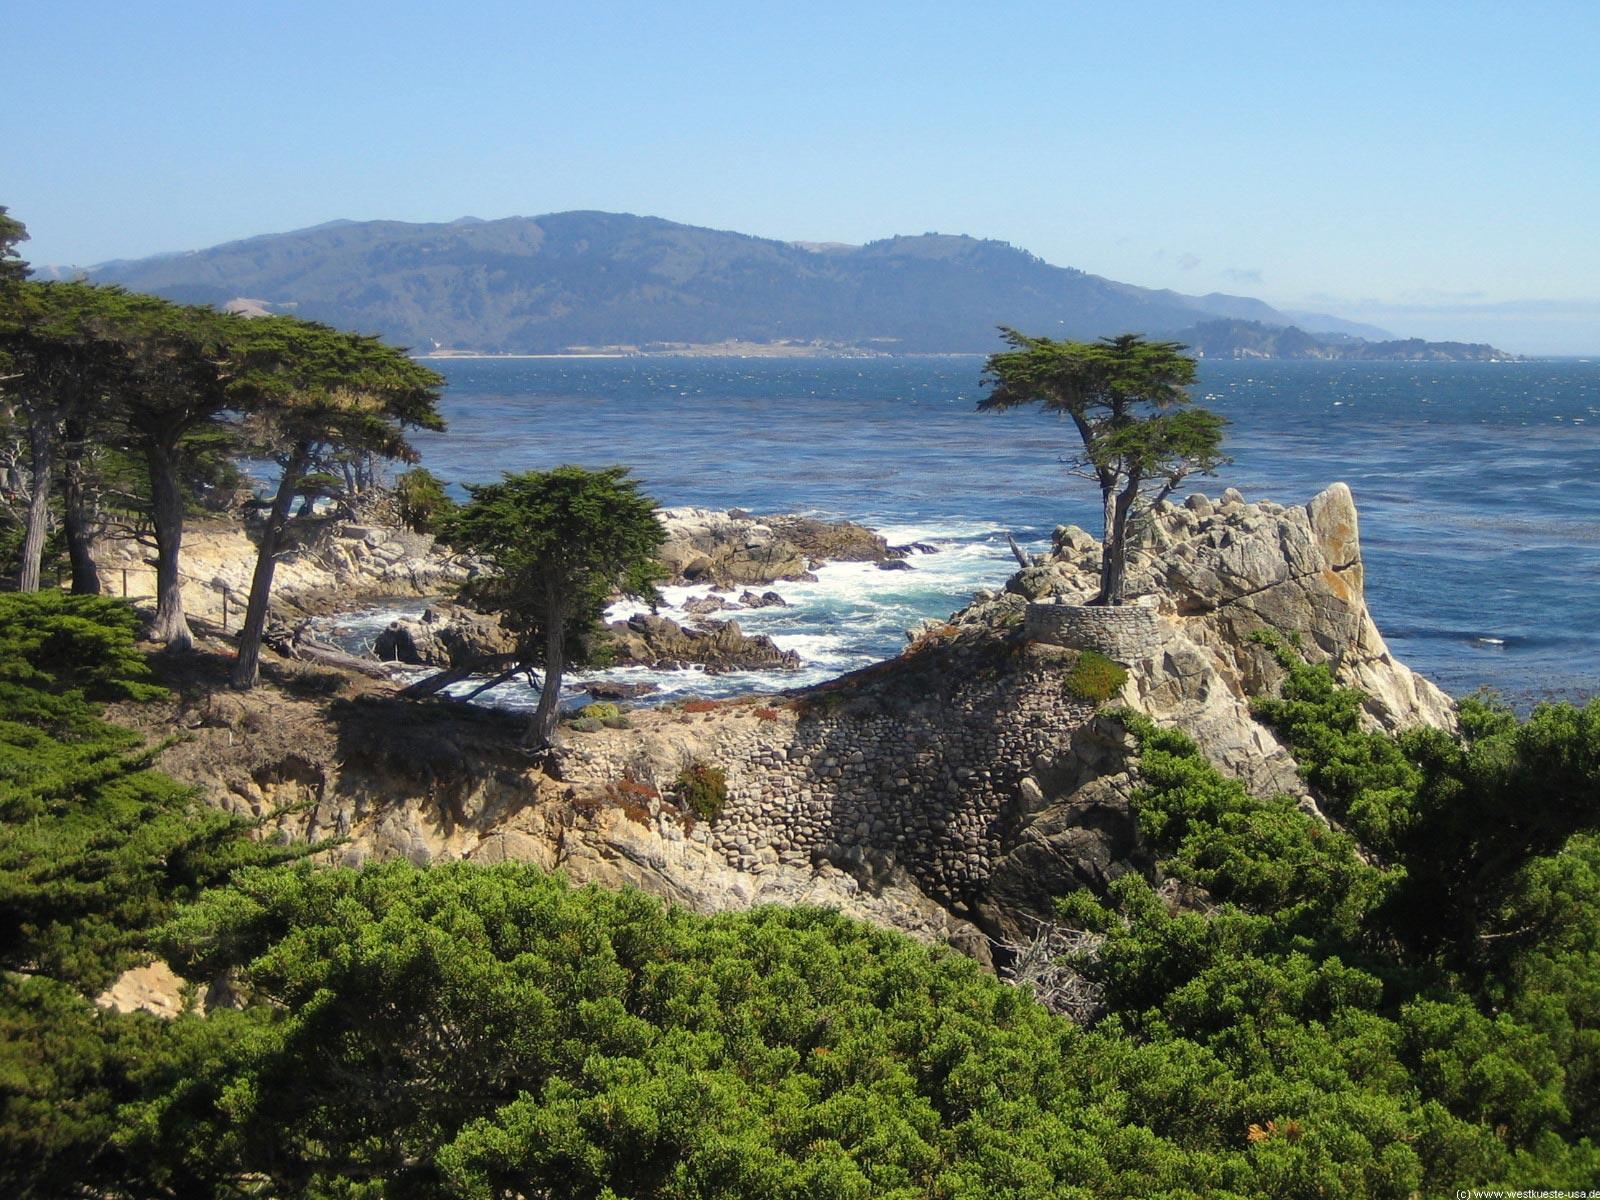 17 Mile Drive Pebble Beach Fanshell Beach Spanish Bay Seal Rock Bird Rock Lone Cypress